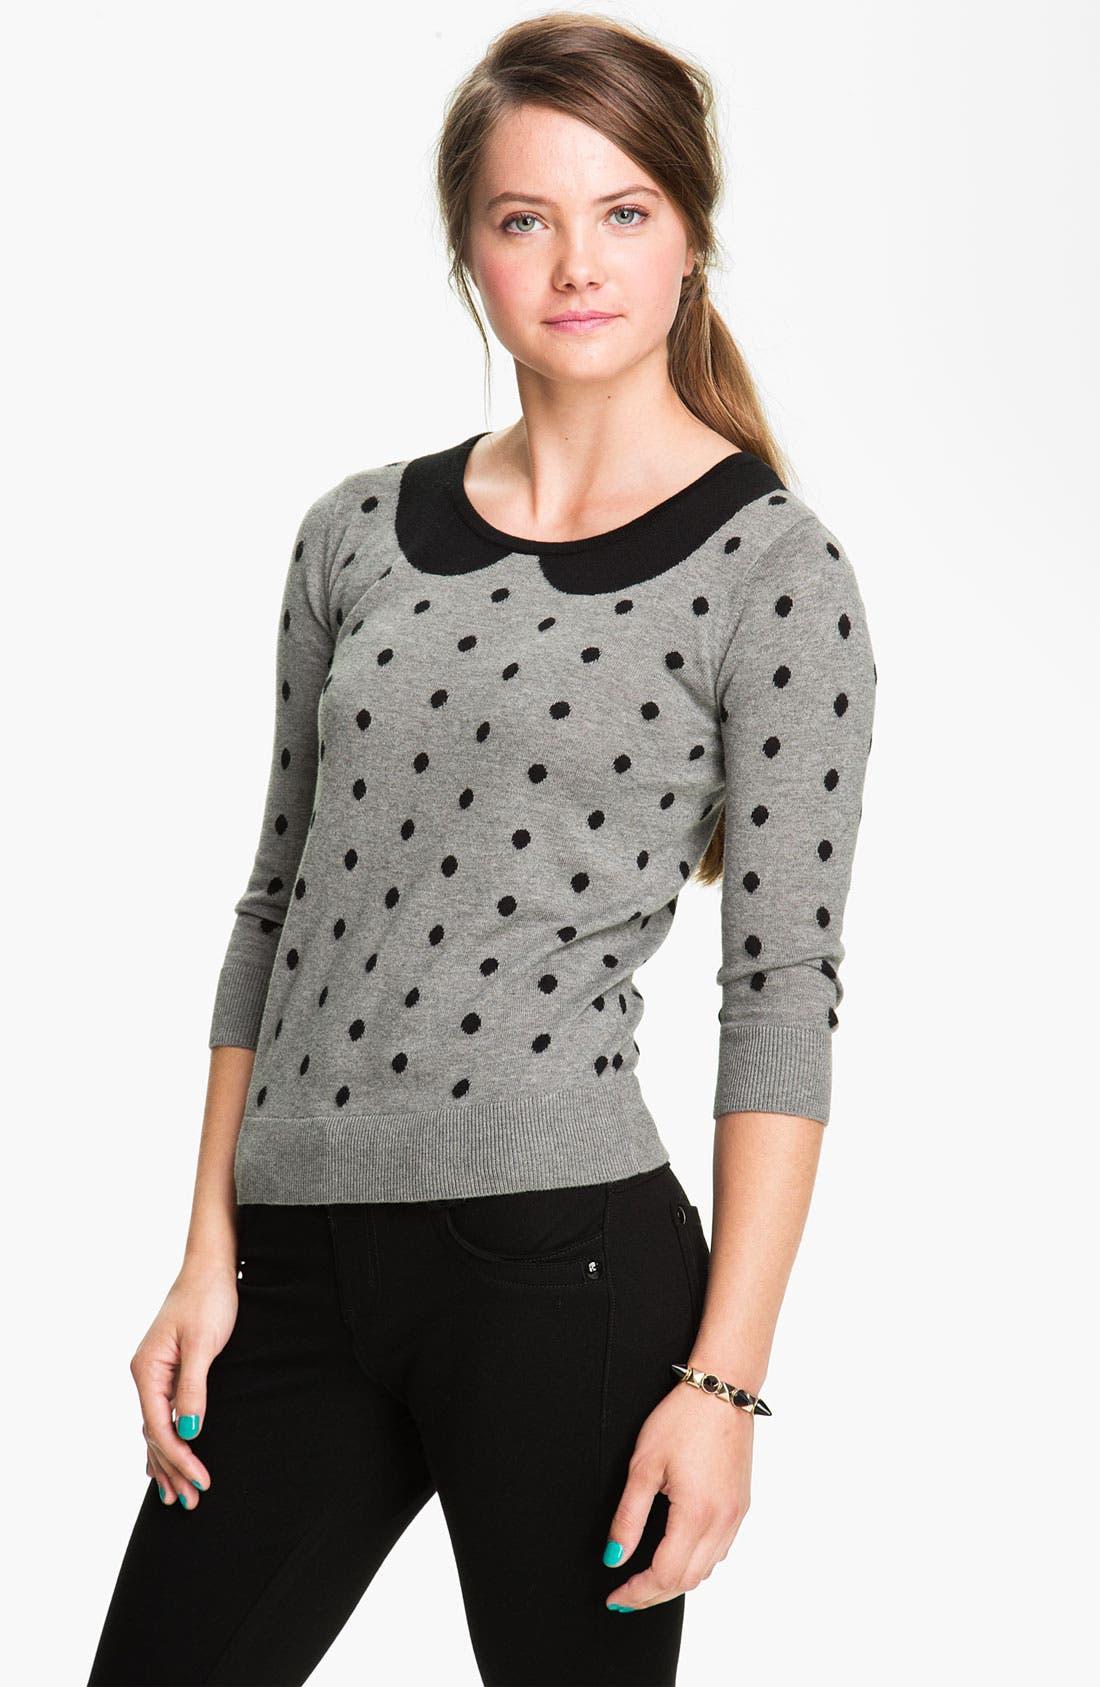 Main Image - Frenchi® Polka Dot Peter Pan Sweater (Juniors)